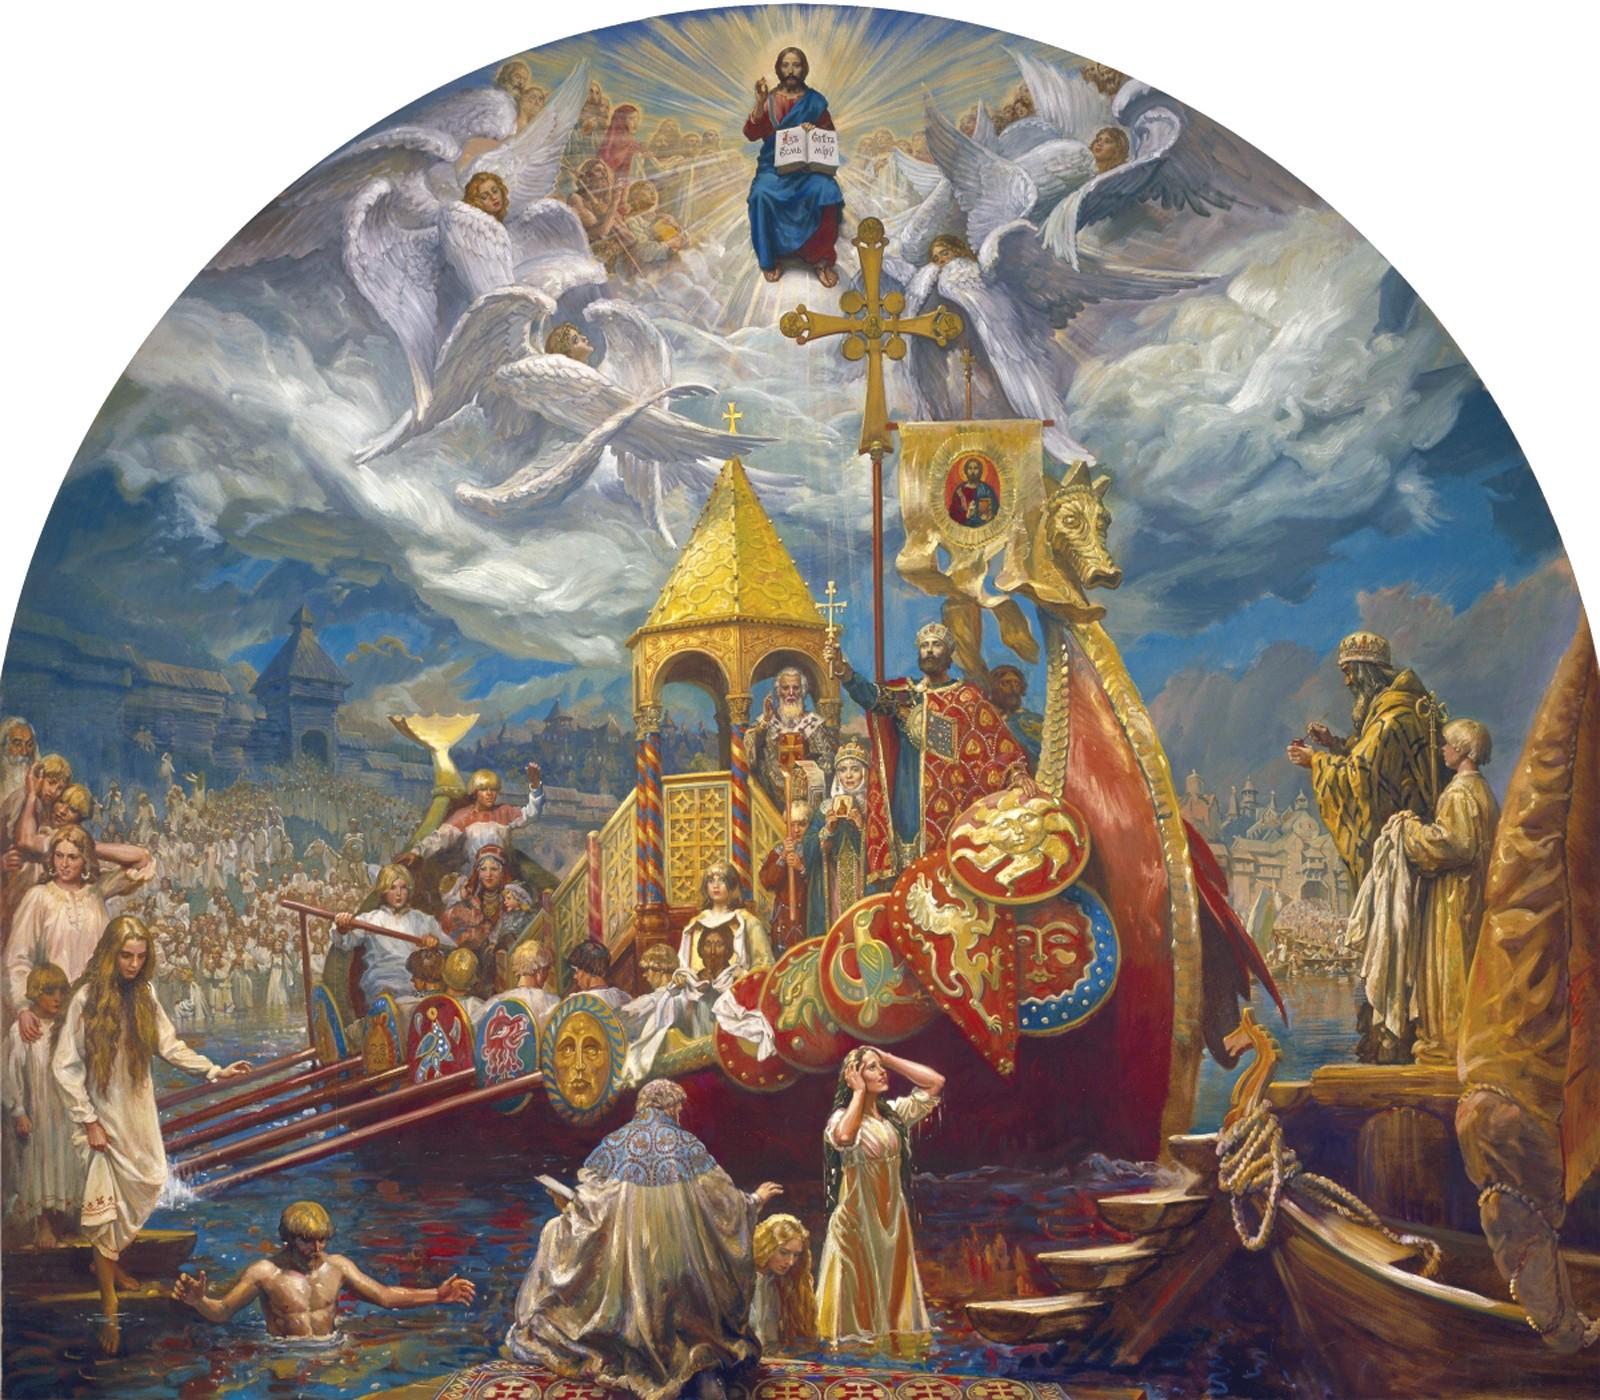 00 Mikhail Shankov. Baptism of Russia. 2003